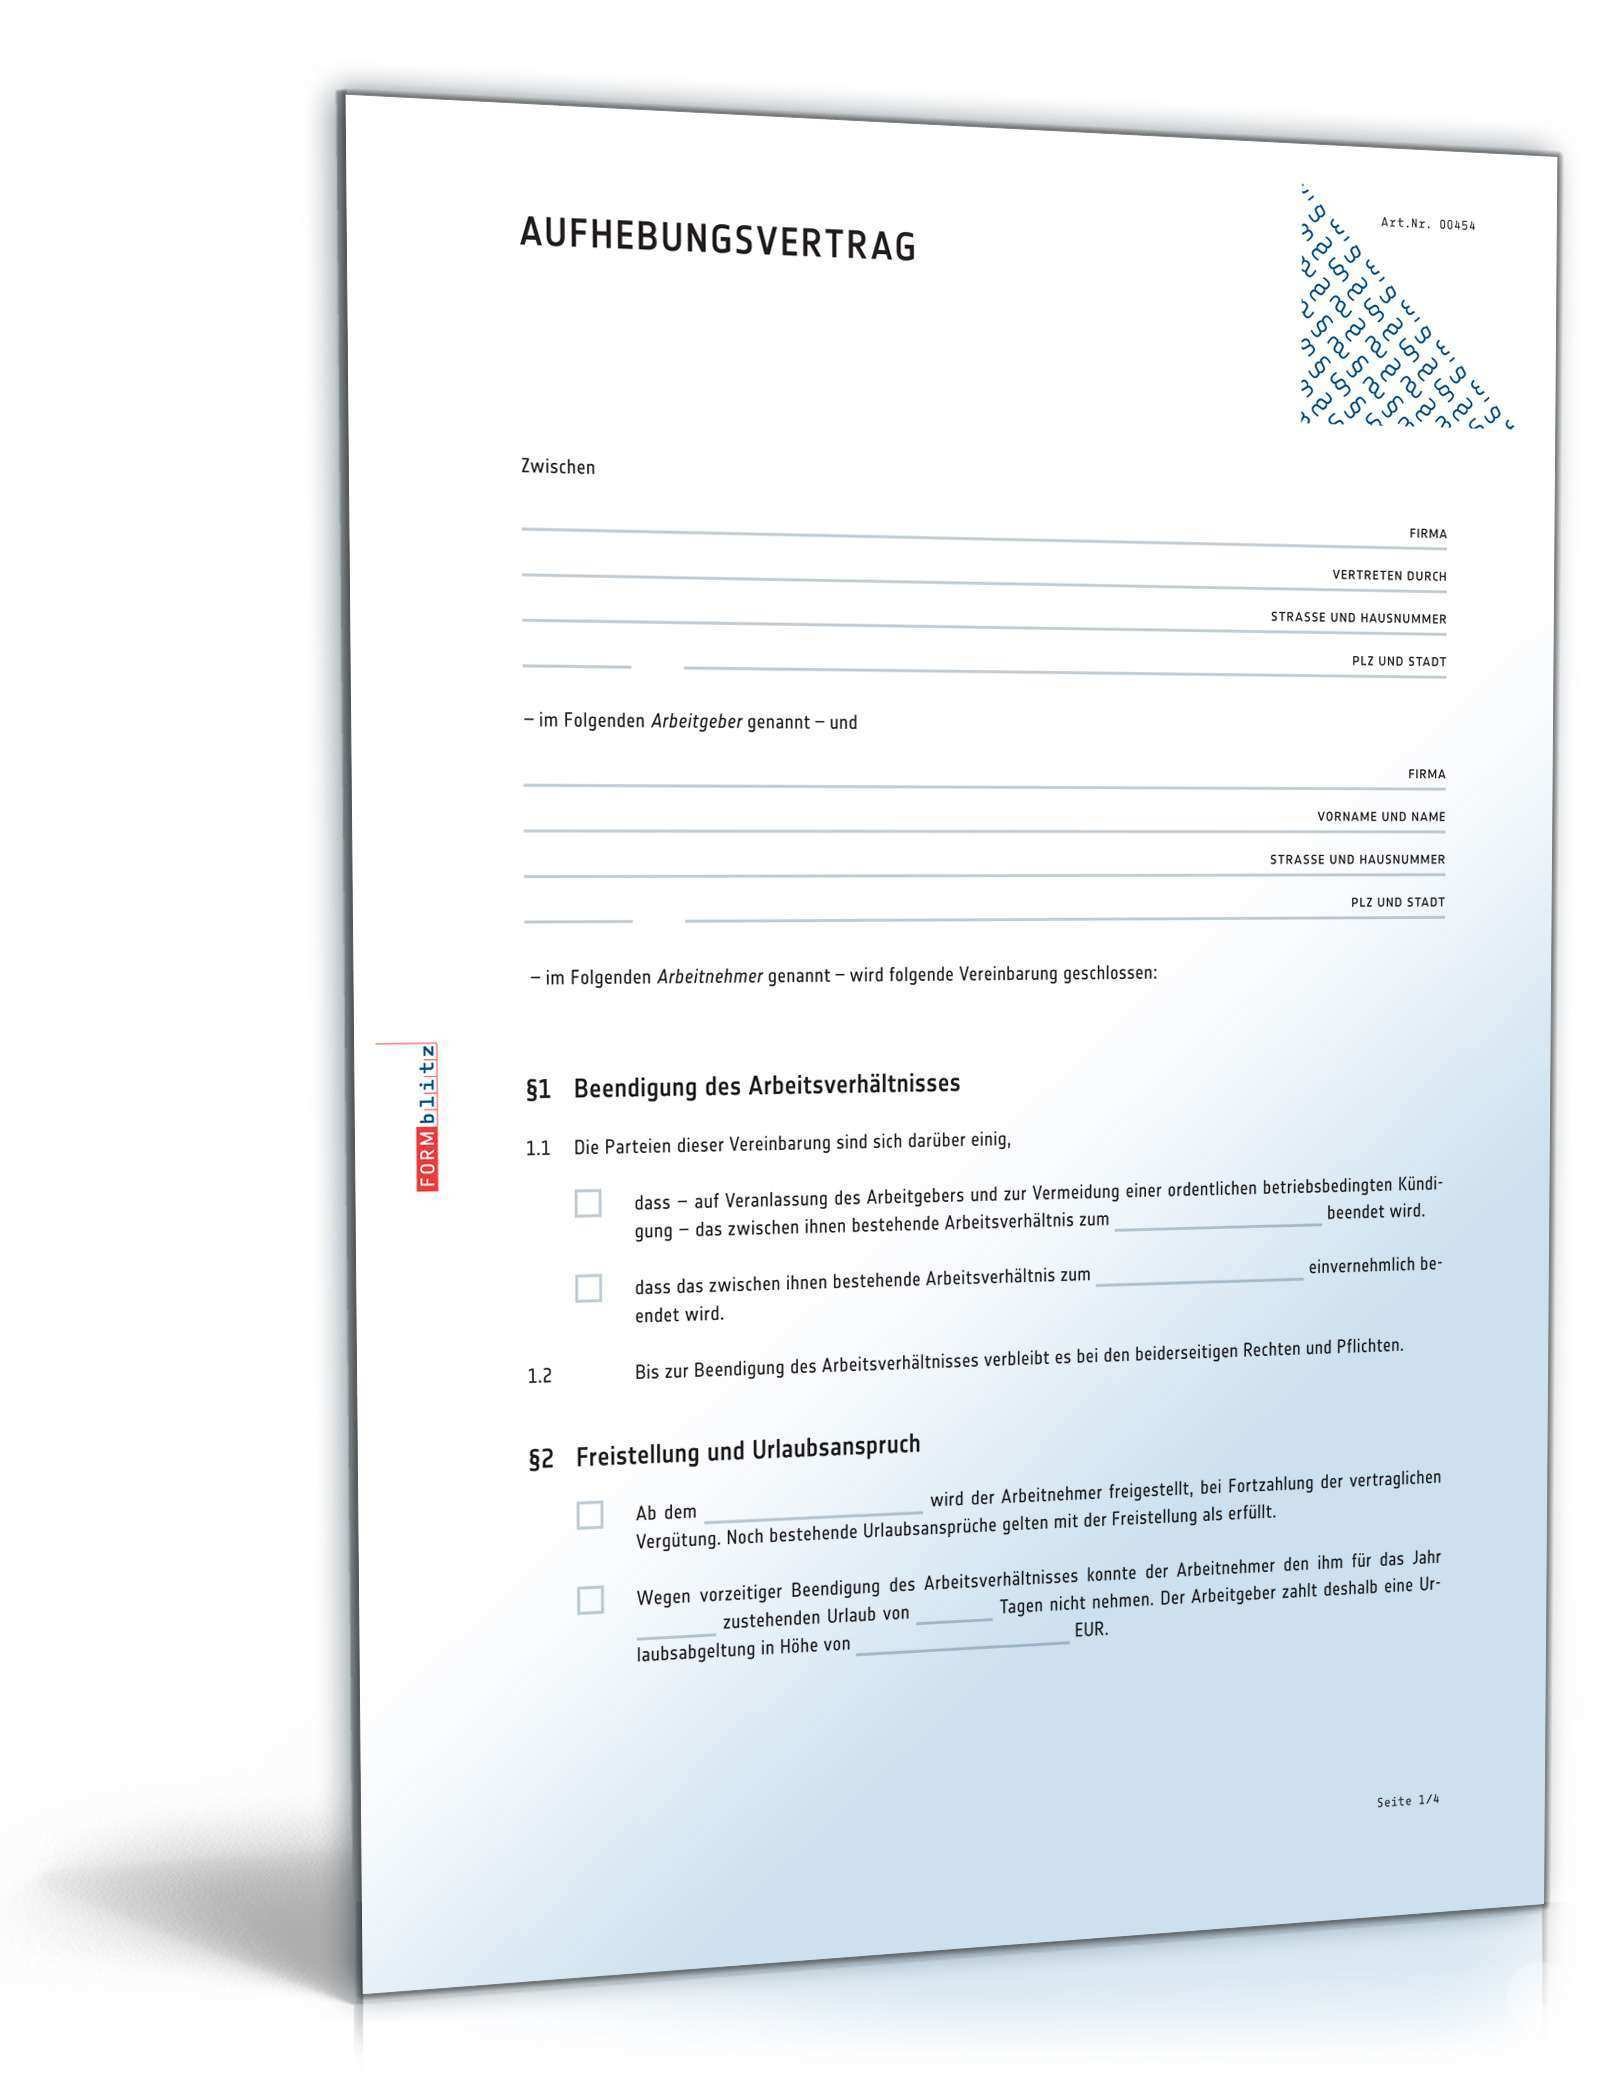 Aufhebungsvertrag Arbeitsverhaltnis Muster Zum Download